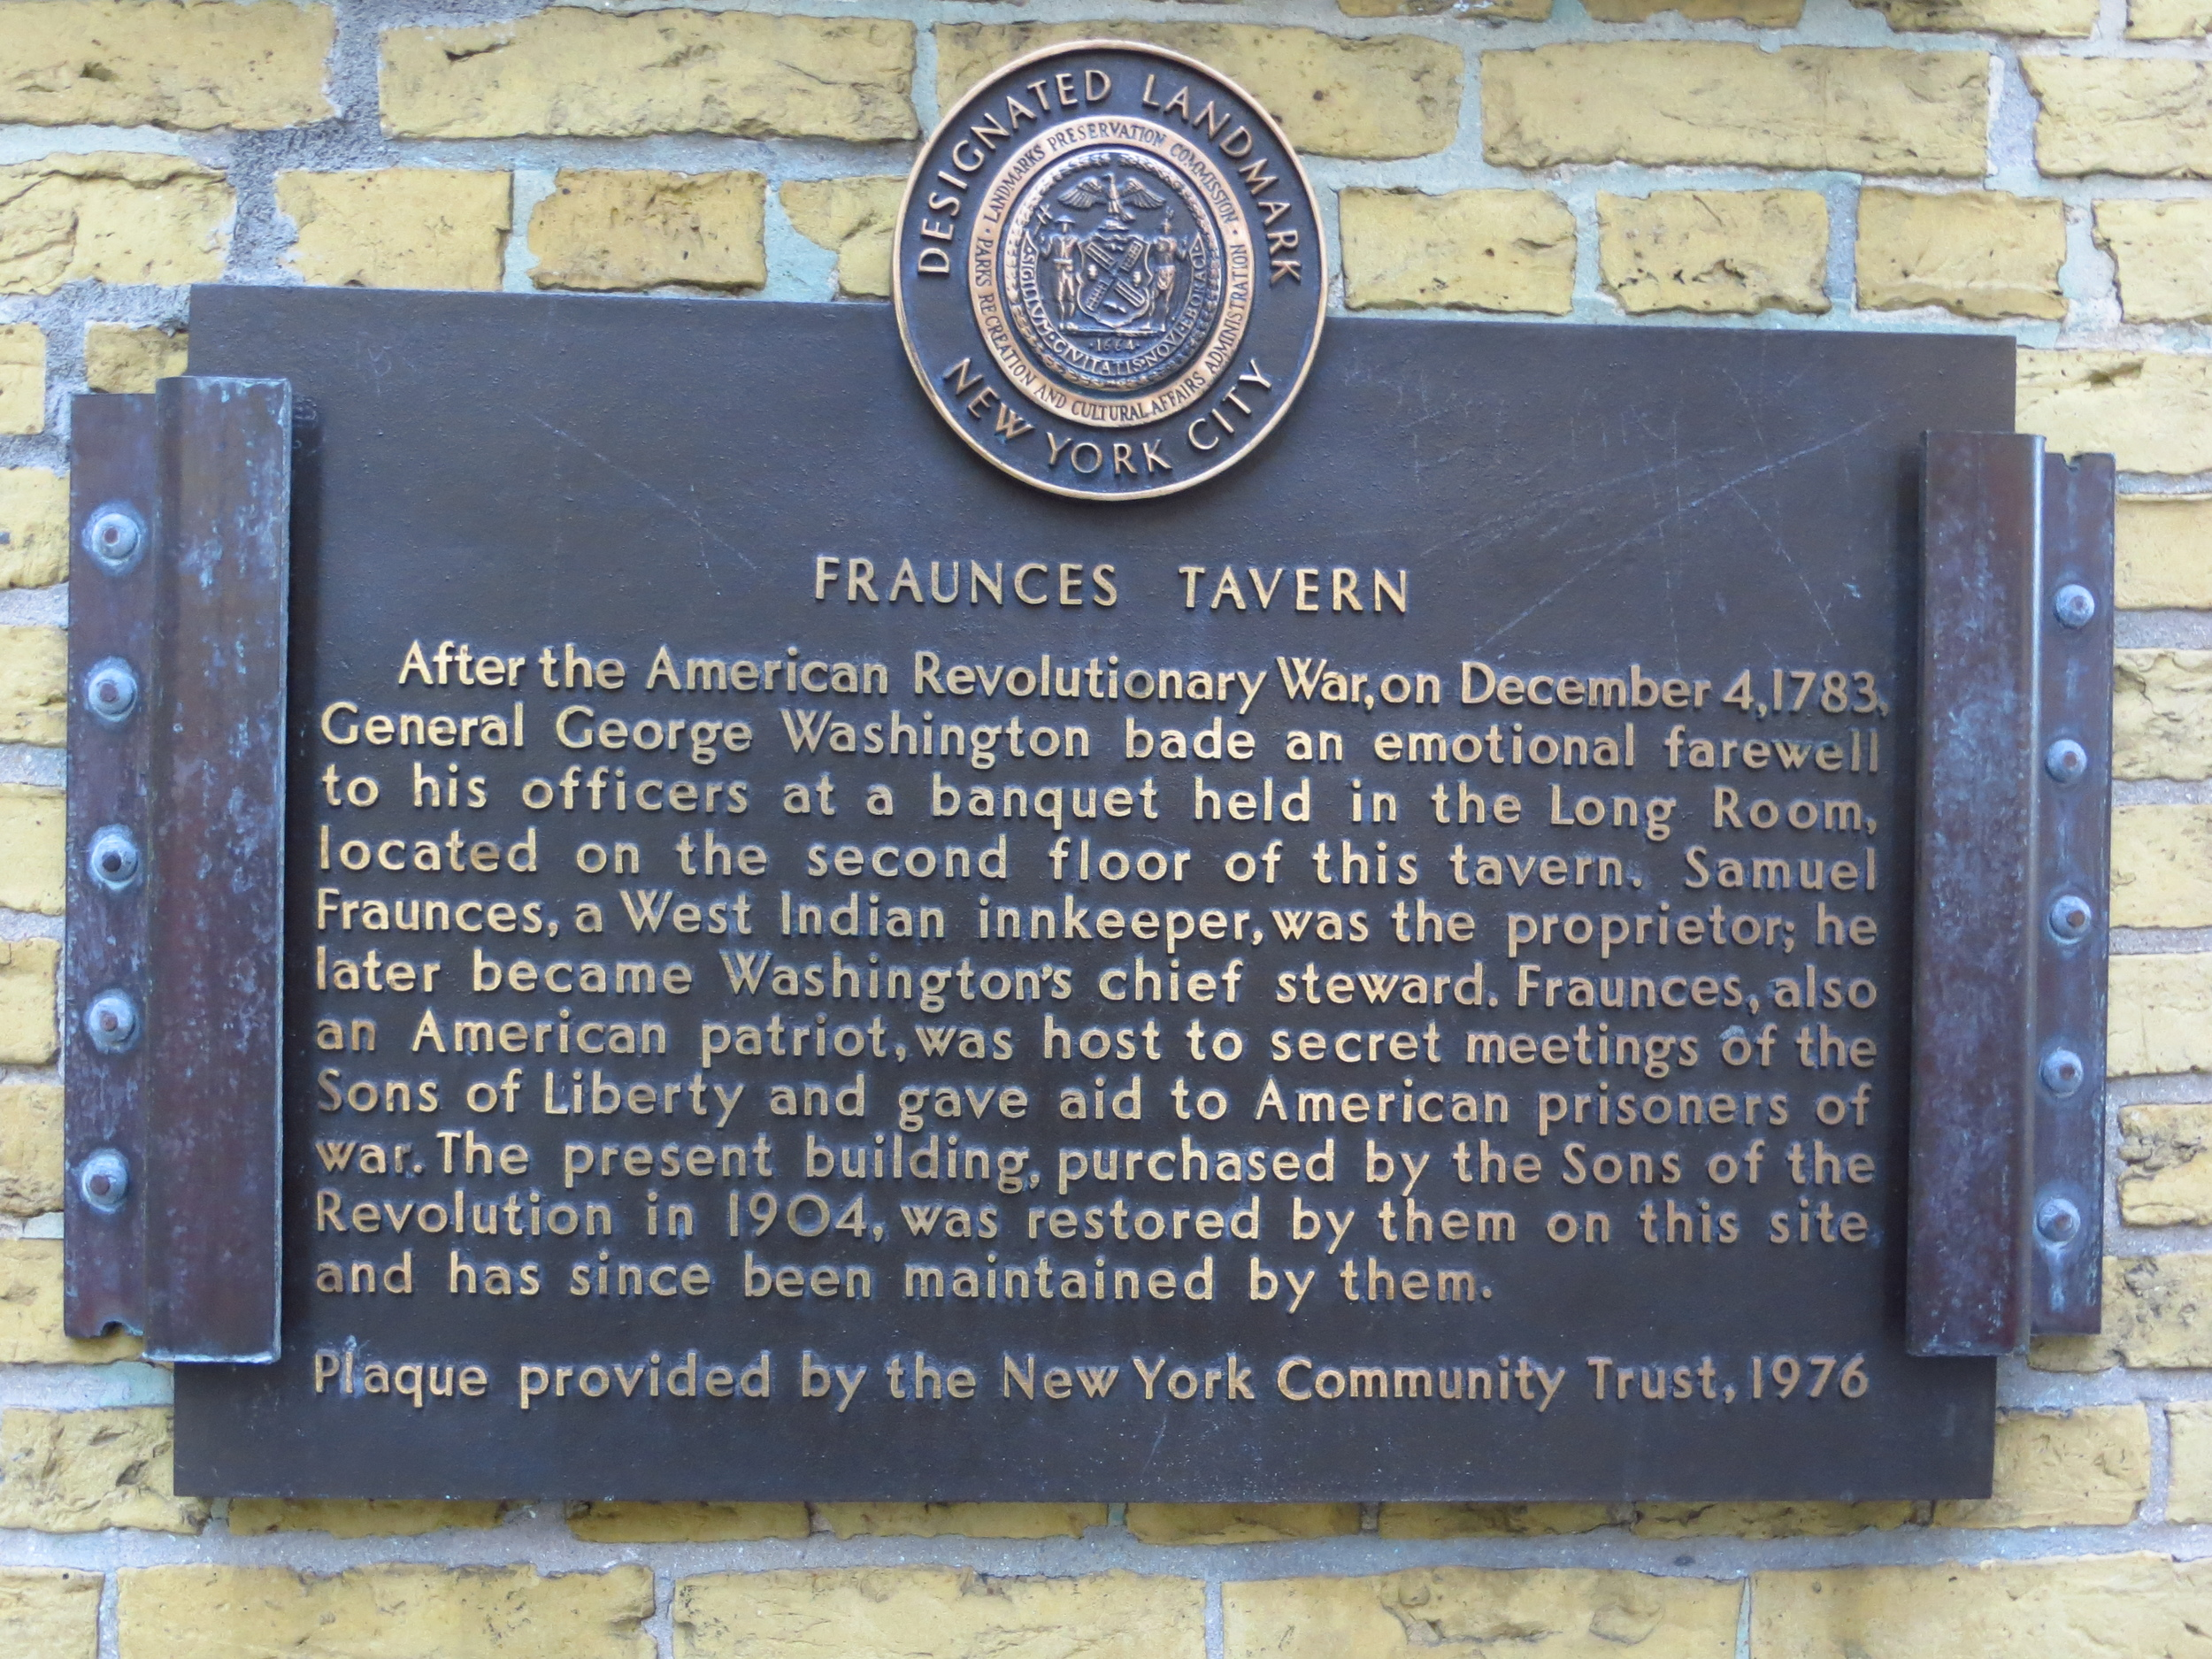 Fraunces Tavern history